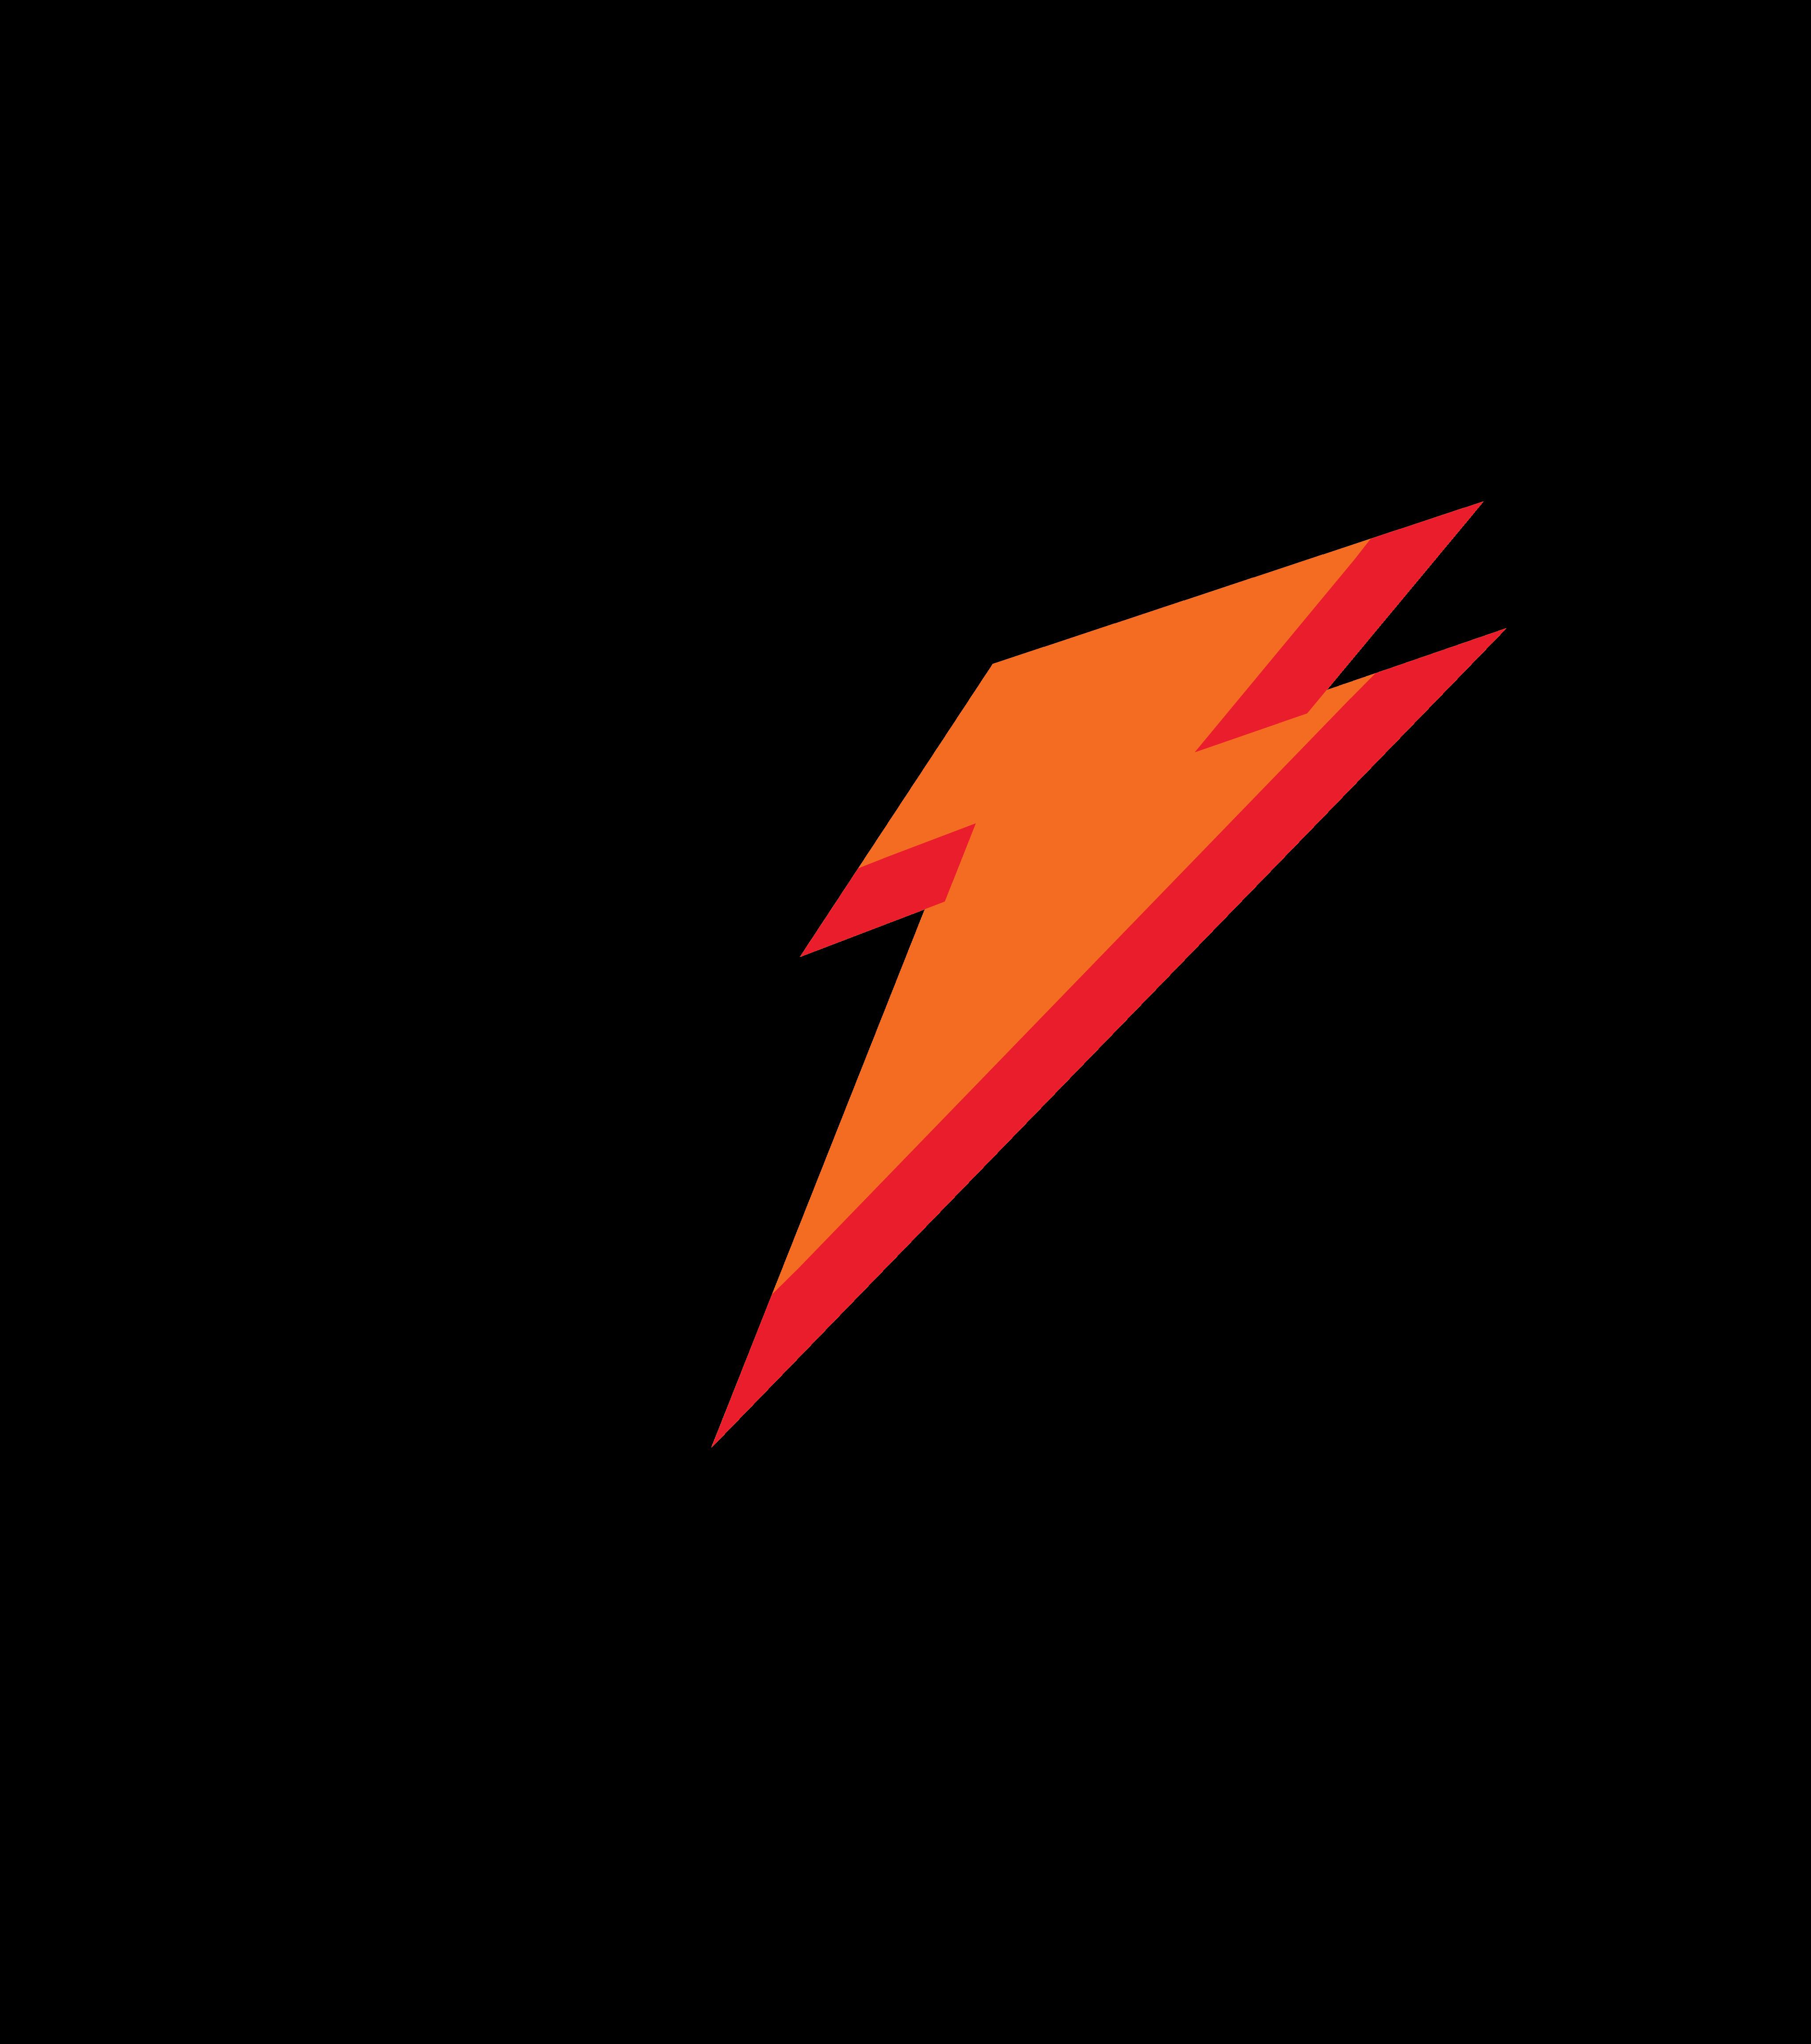 gatorade logo 3 - Gatorade Logo